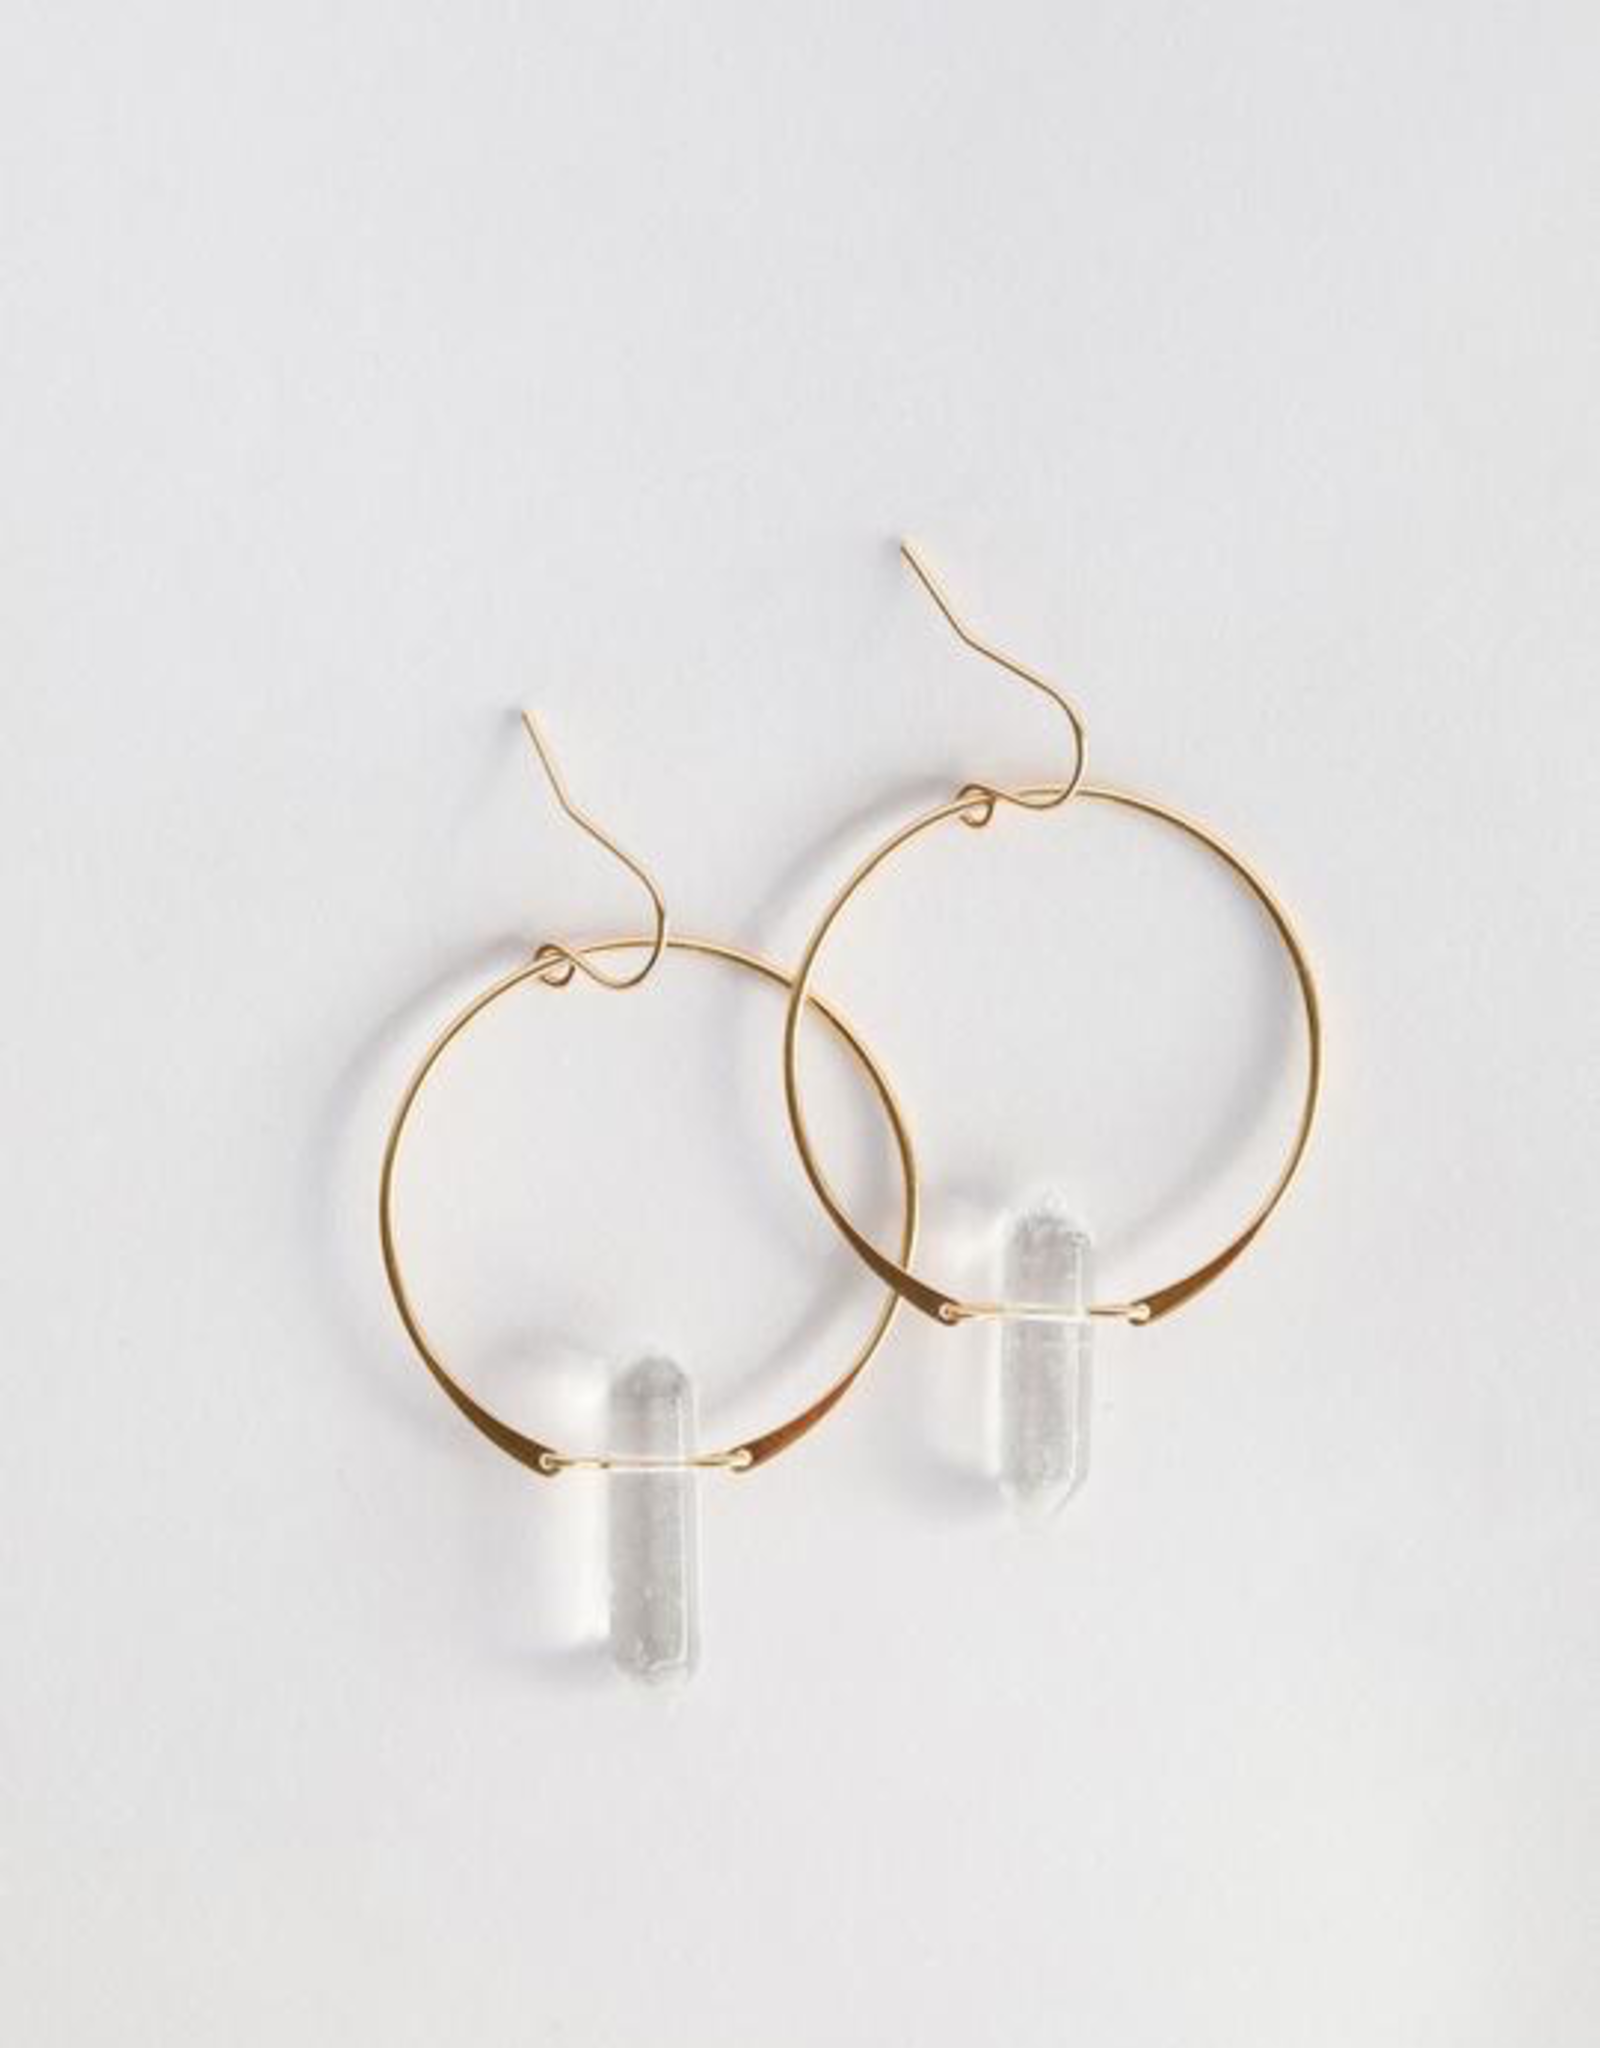 Hoop Earring, Clear Quartz, 18K Gold Plating over Sterling Silver